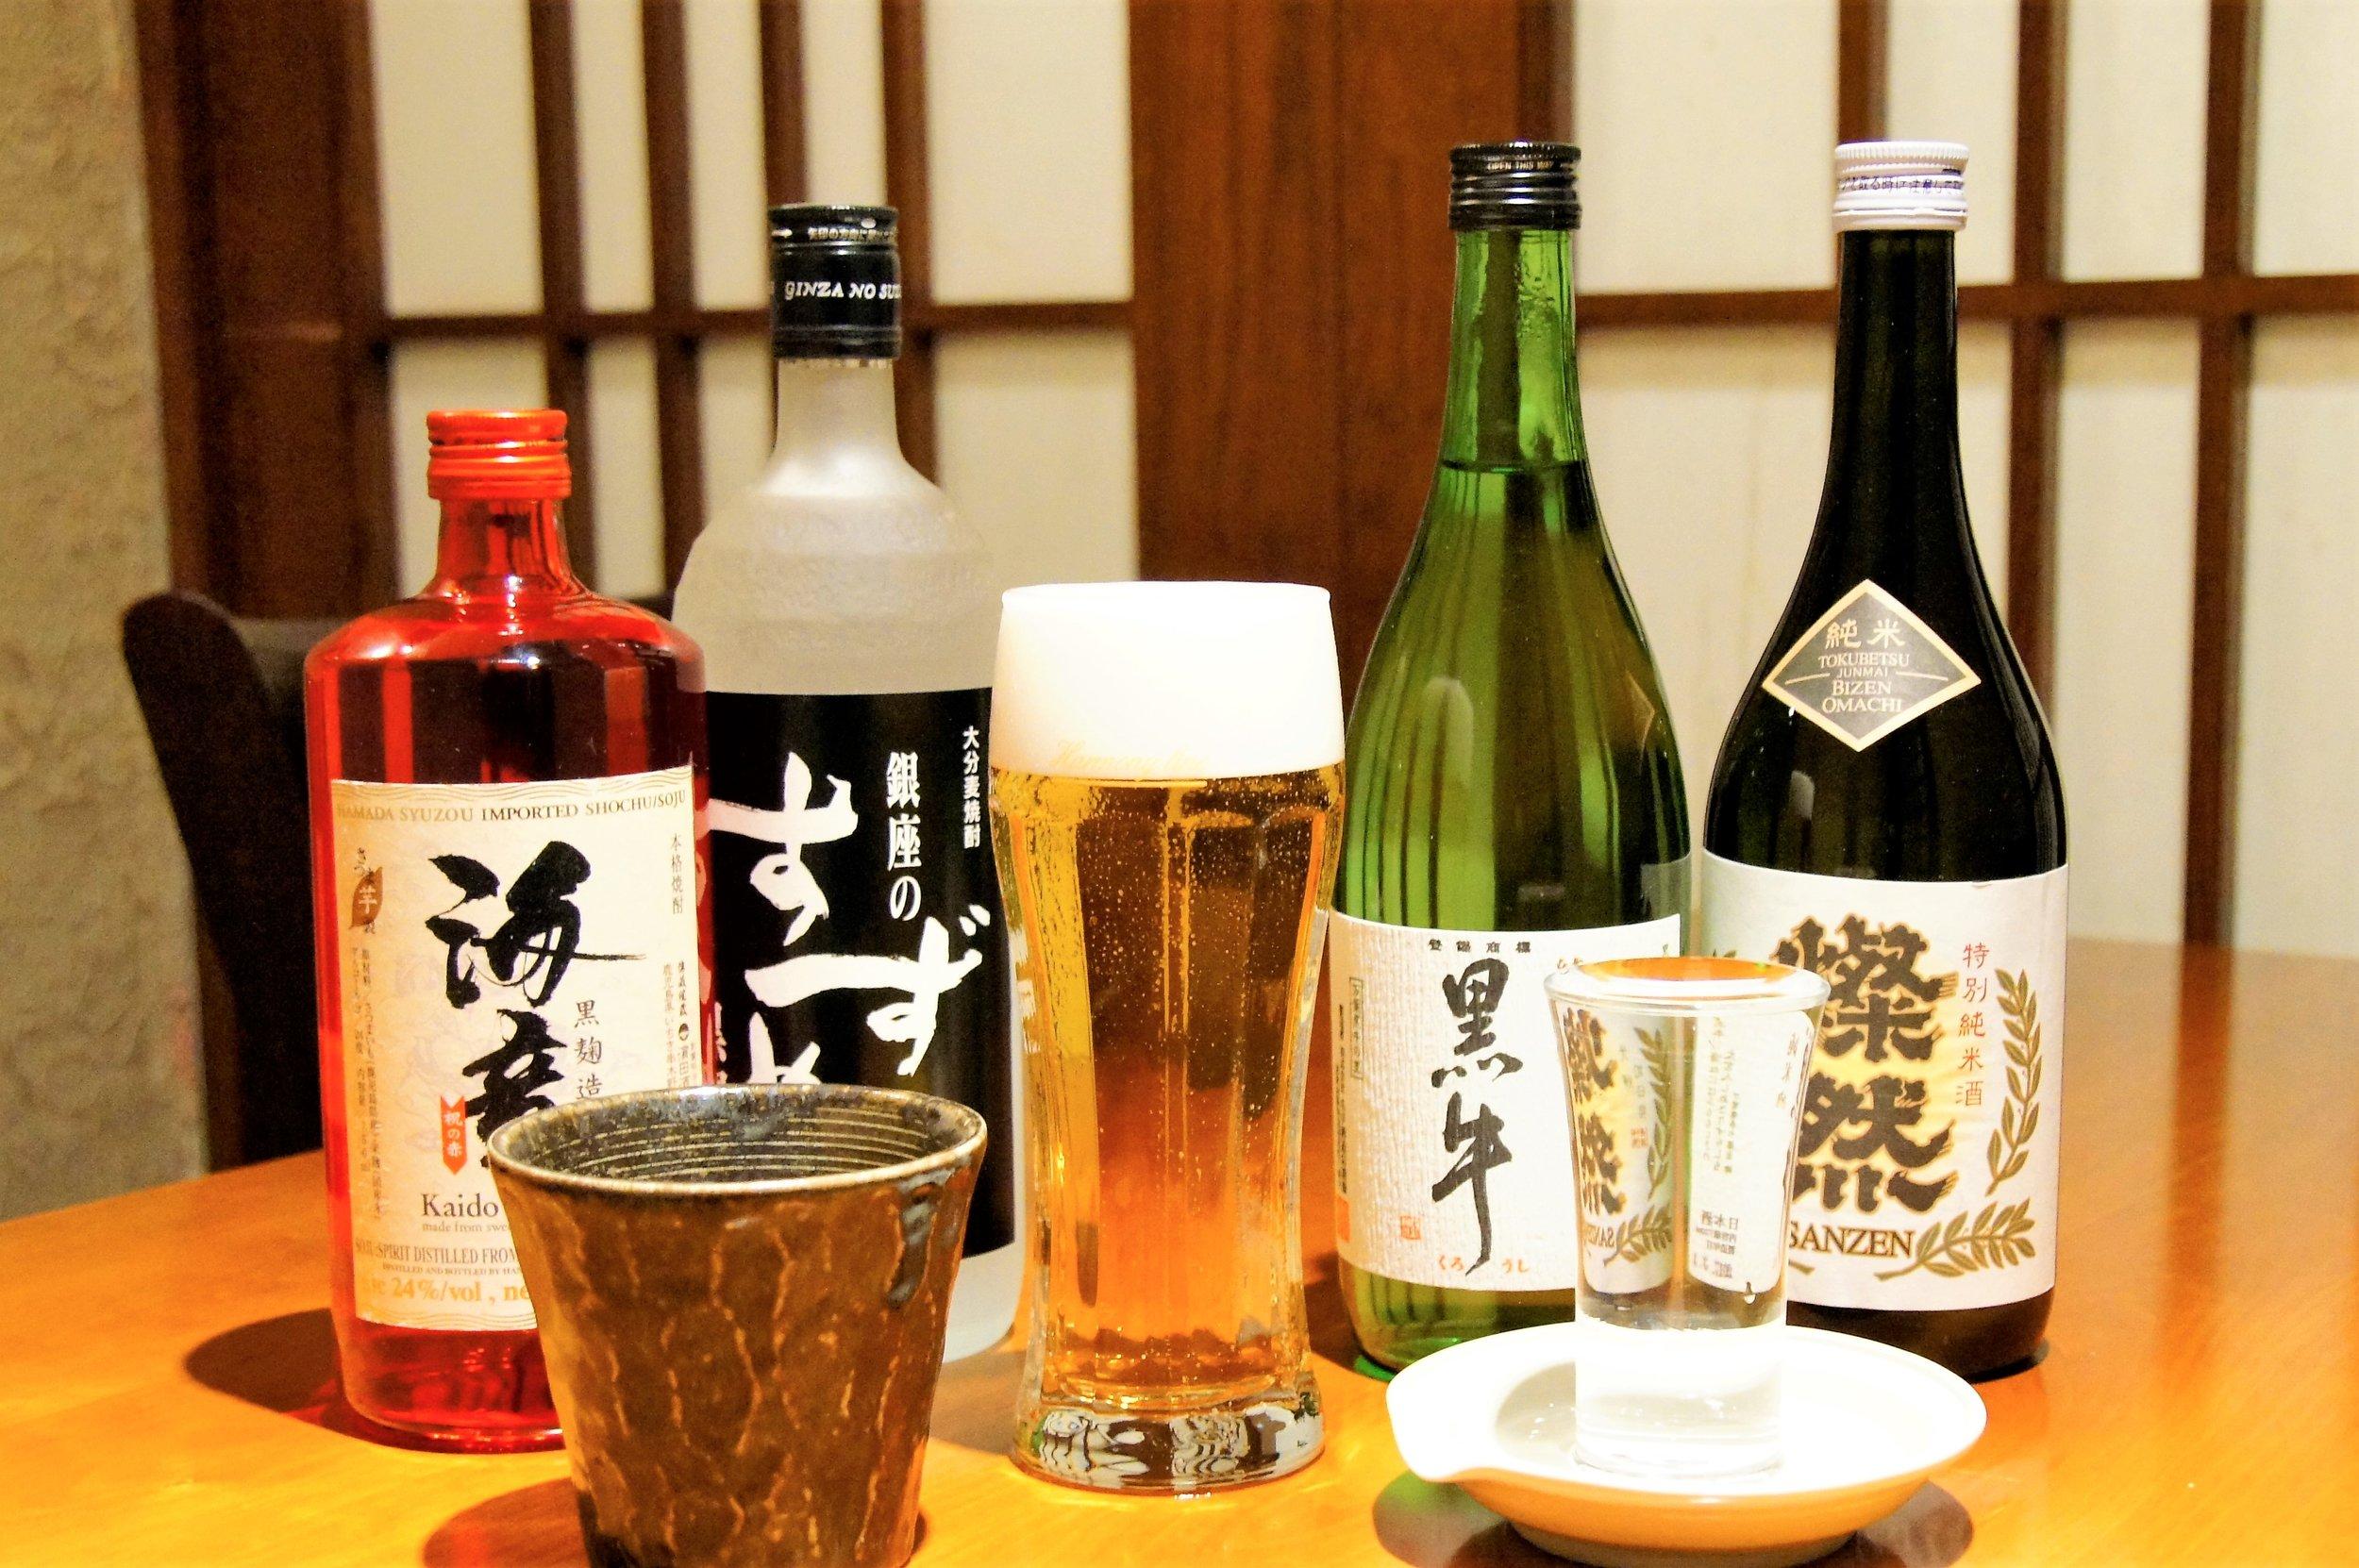 10th Anni choice of drink.jpg